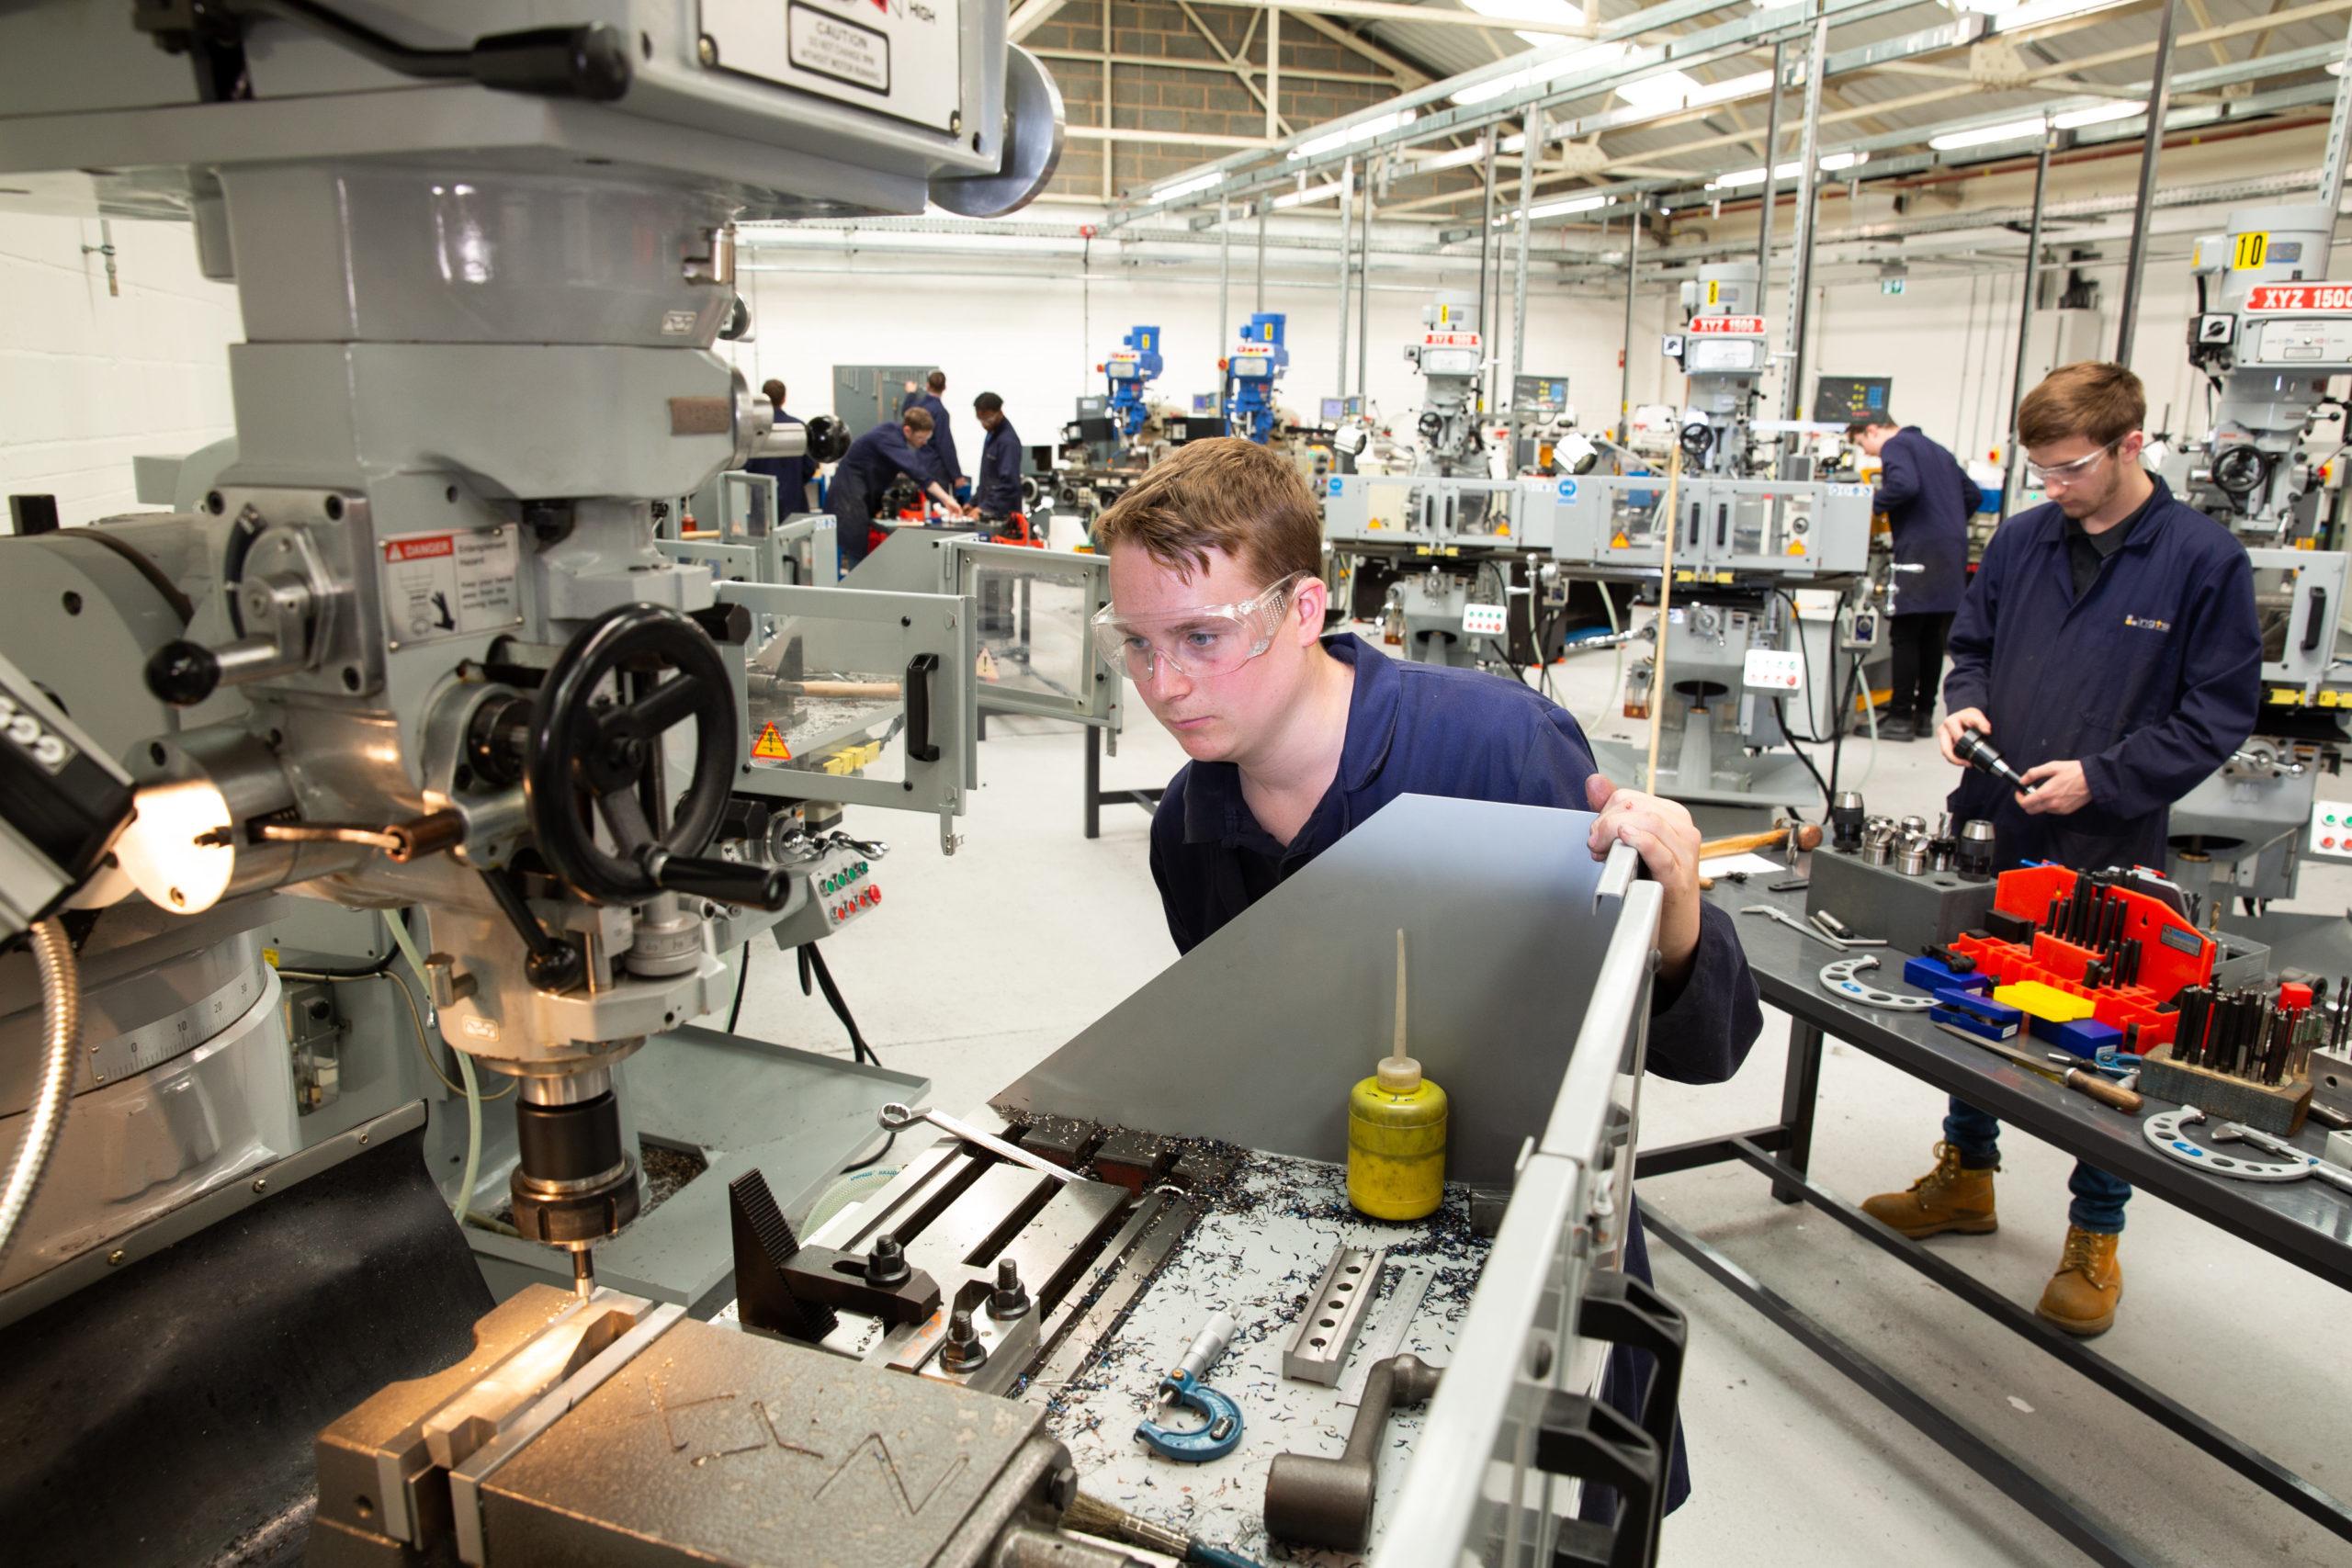 Engineering apprentice using milling machine